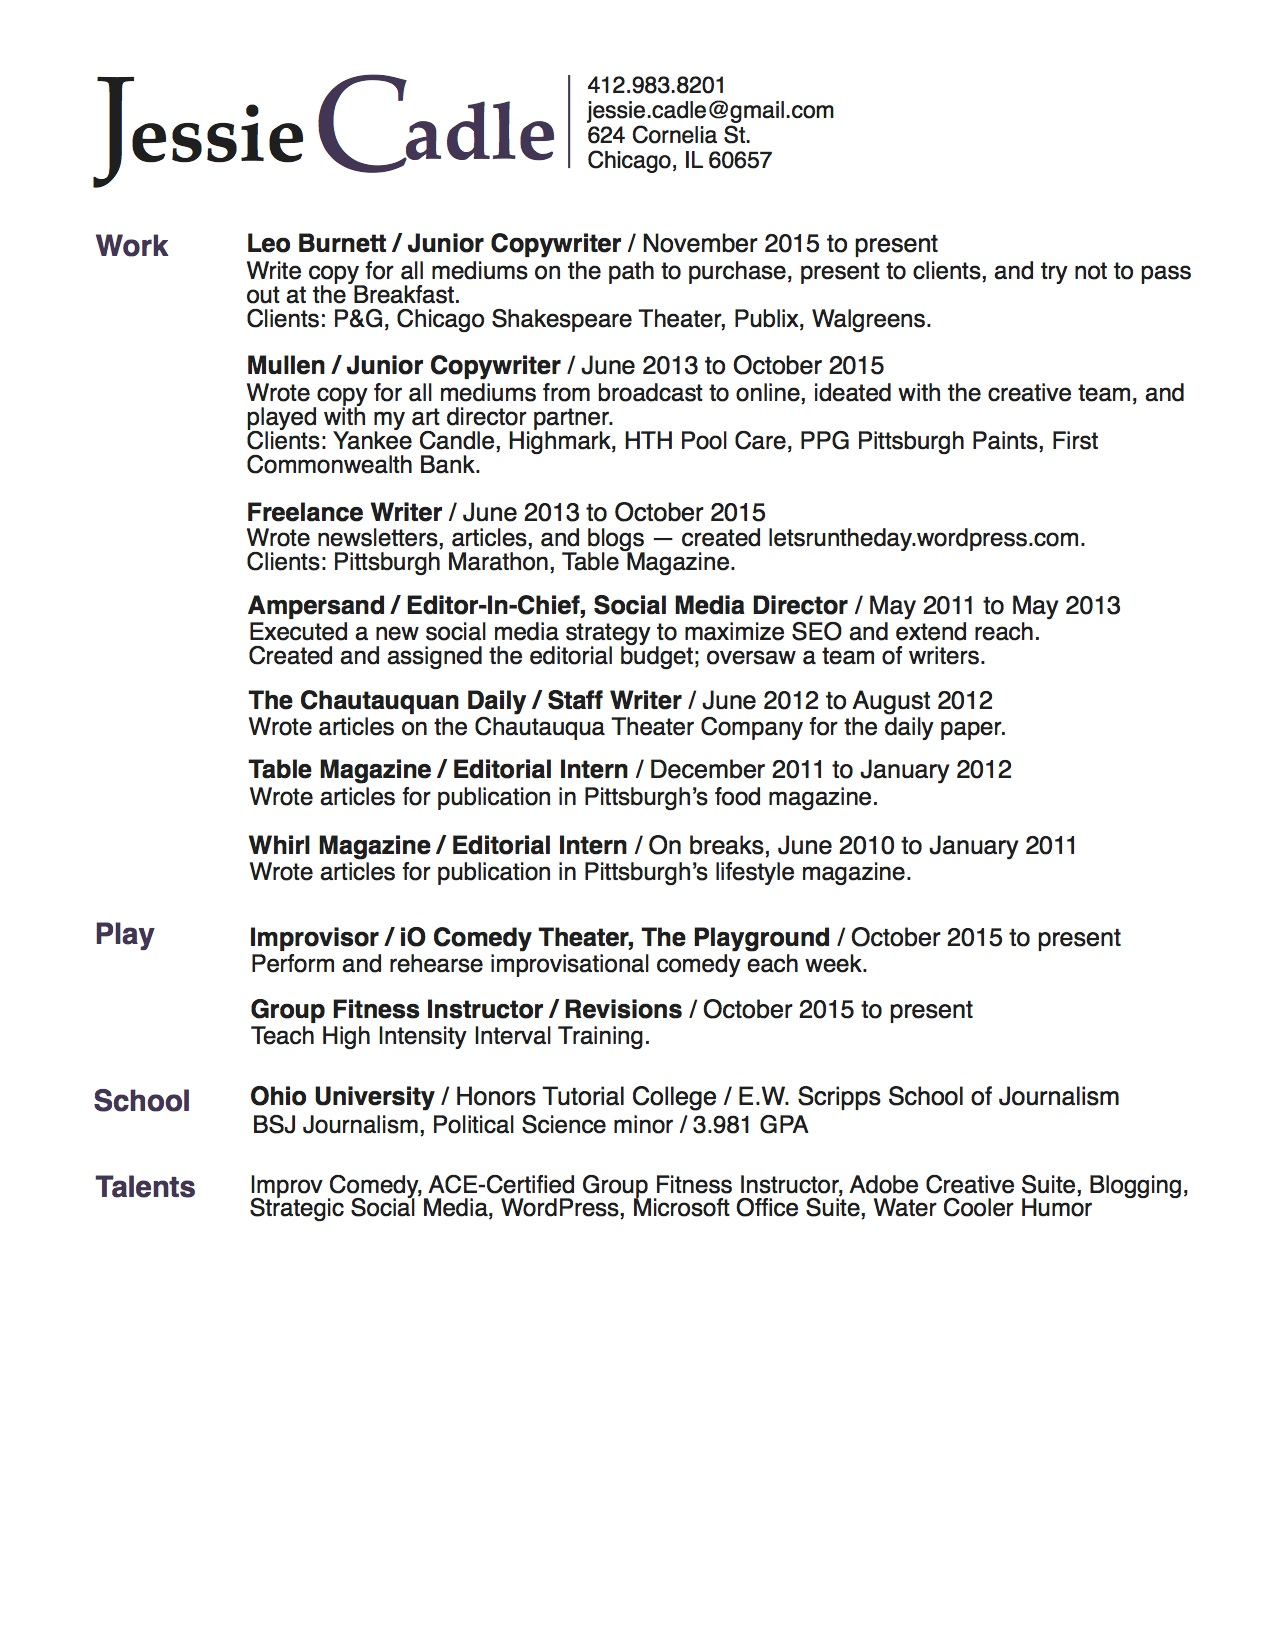 Walgreens Resume sales executive resume – Walgreens Resume